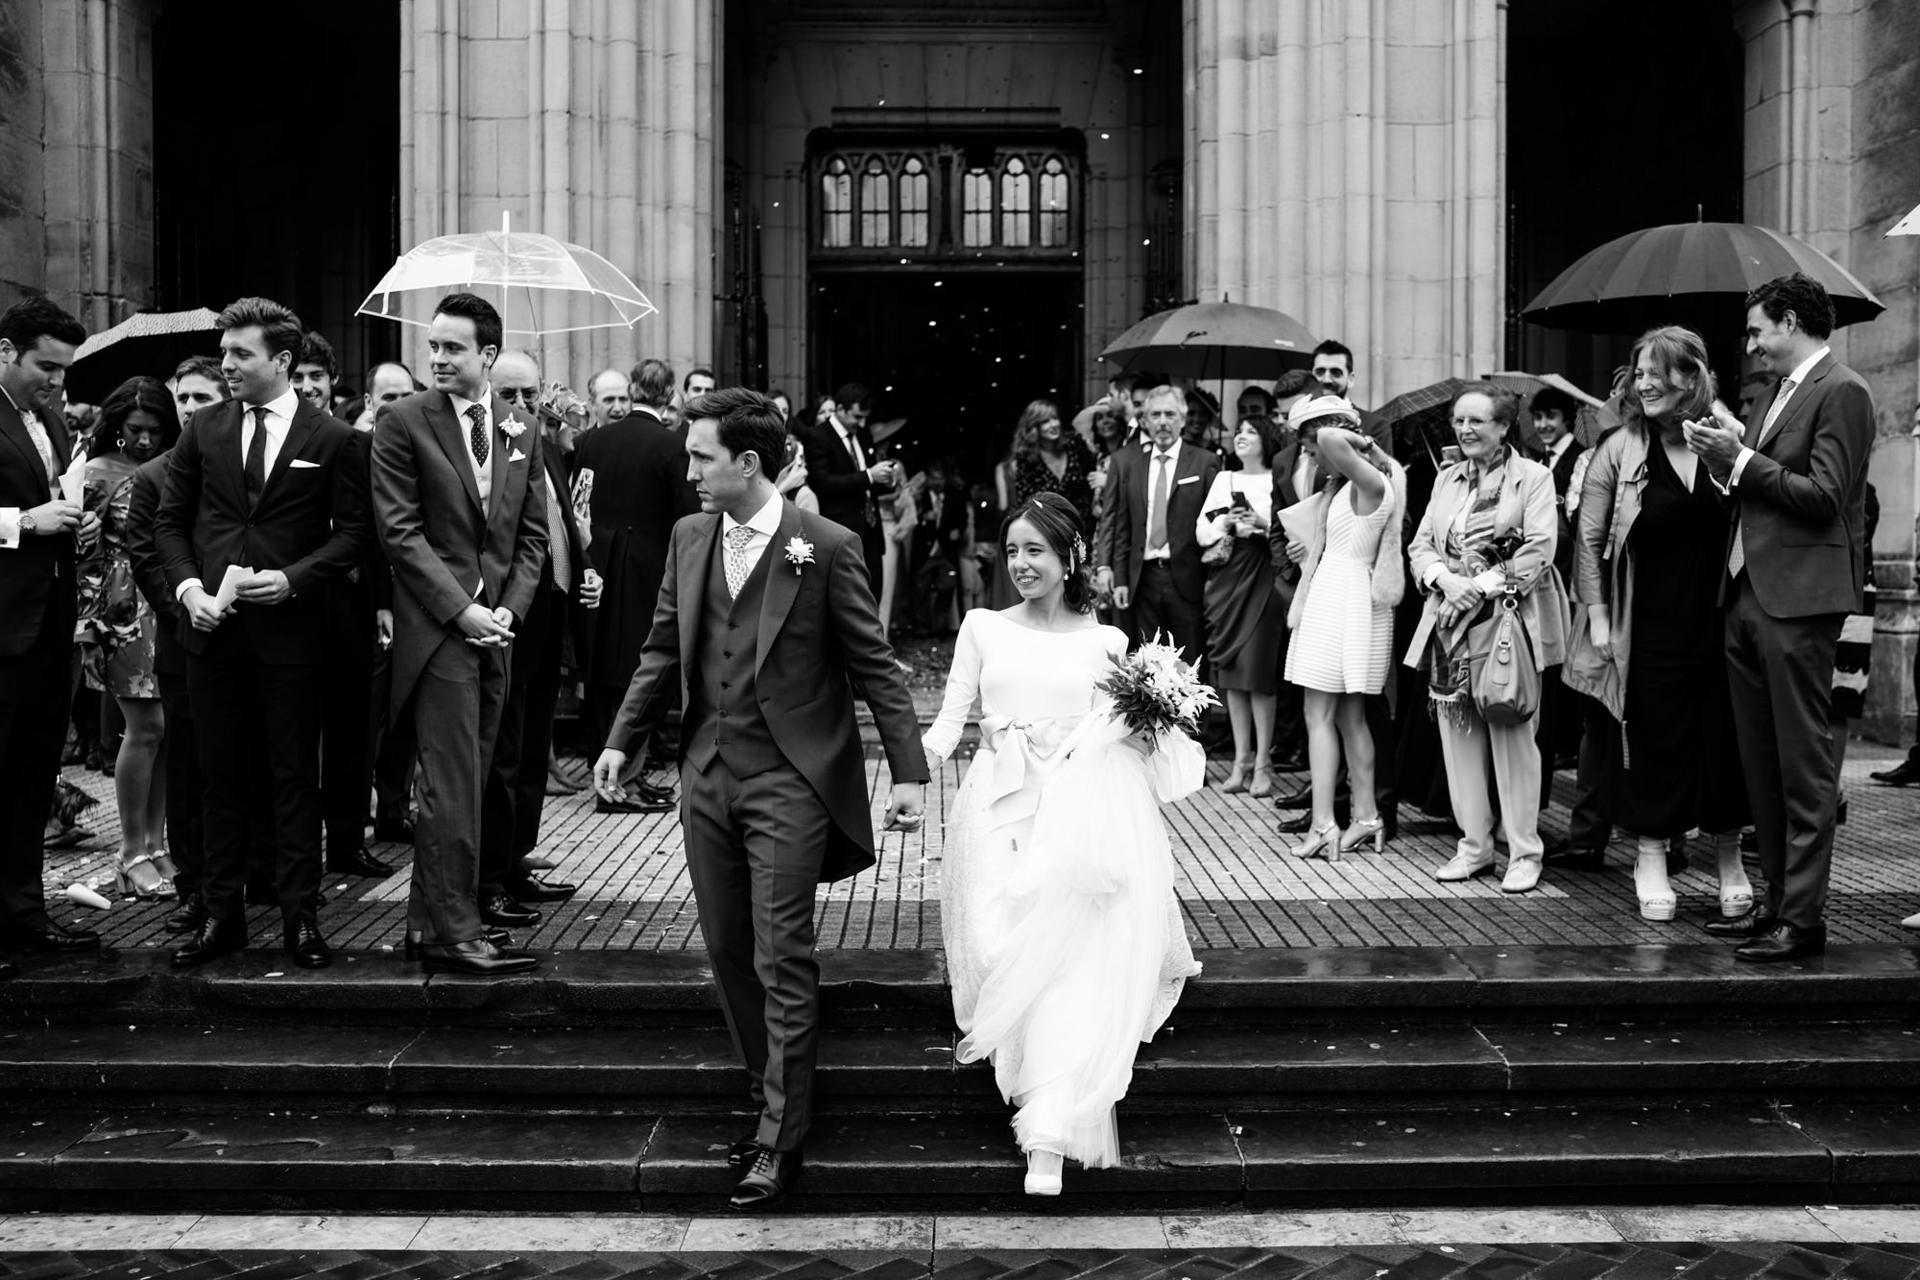 Wedding & Event Planner - Destination Wedding en San Sebastián - Boda Beatriz y Gonzalo 01